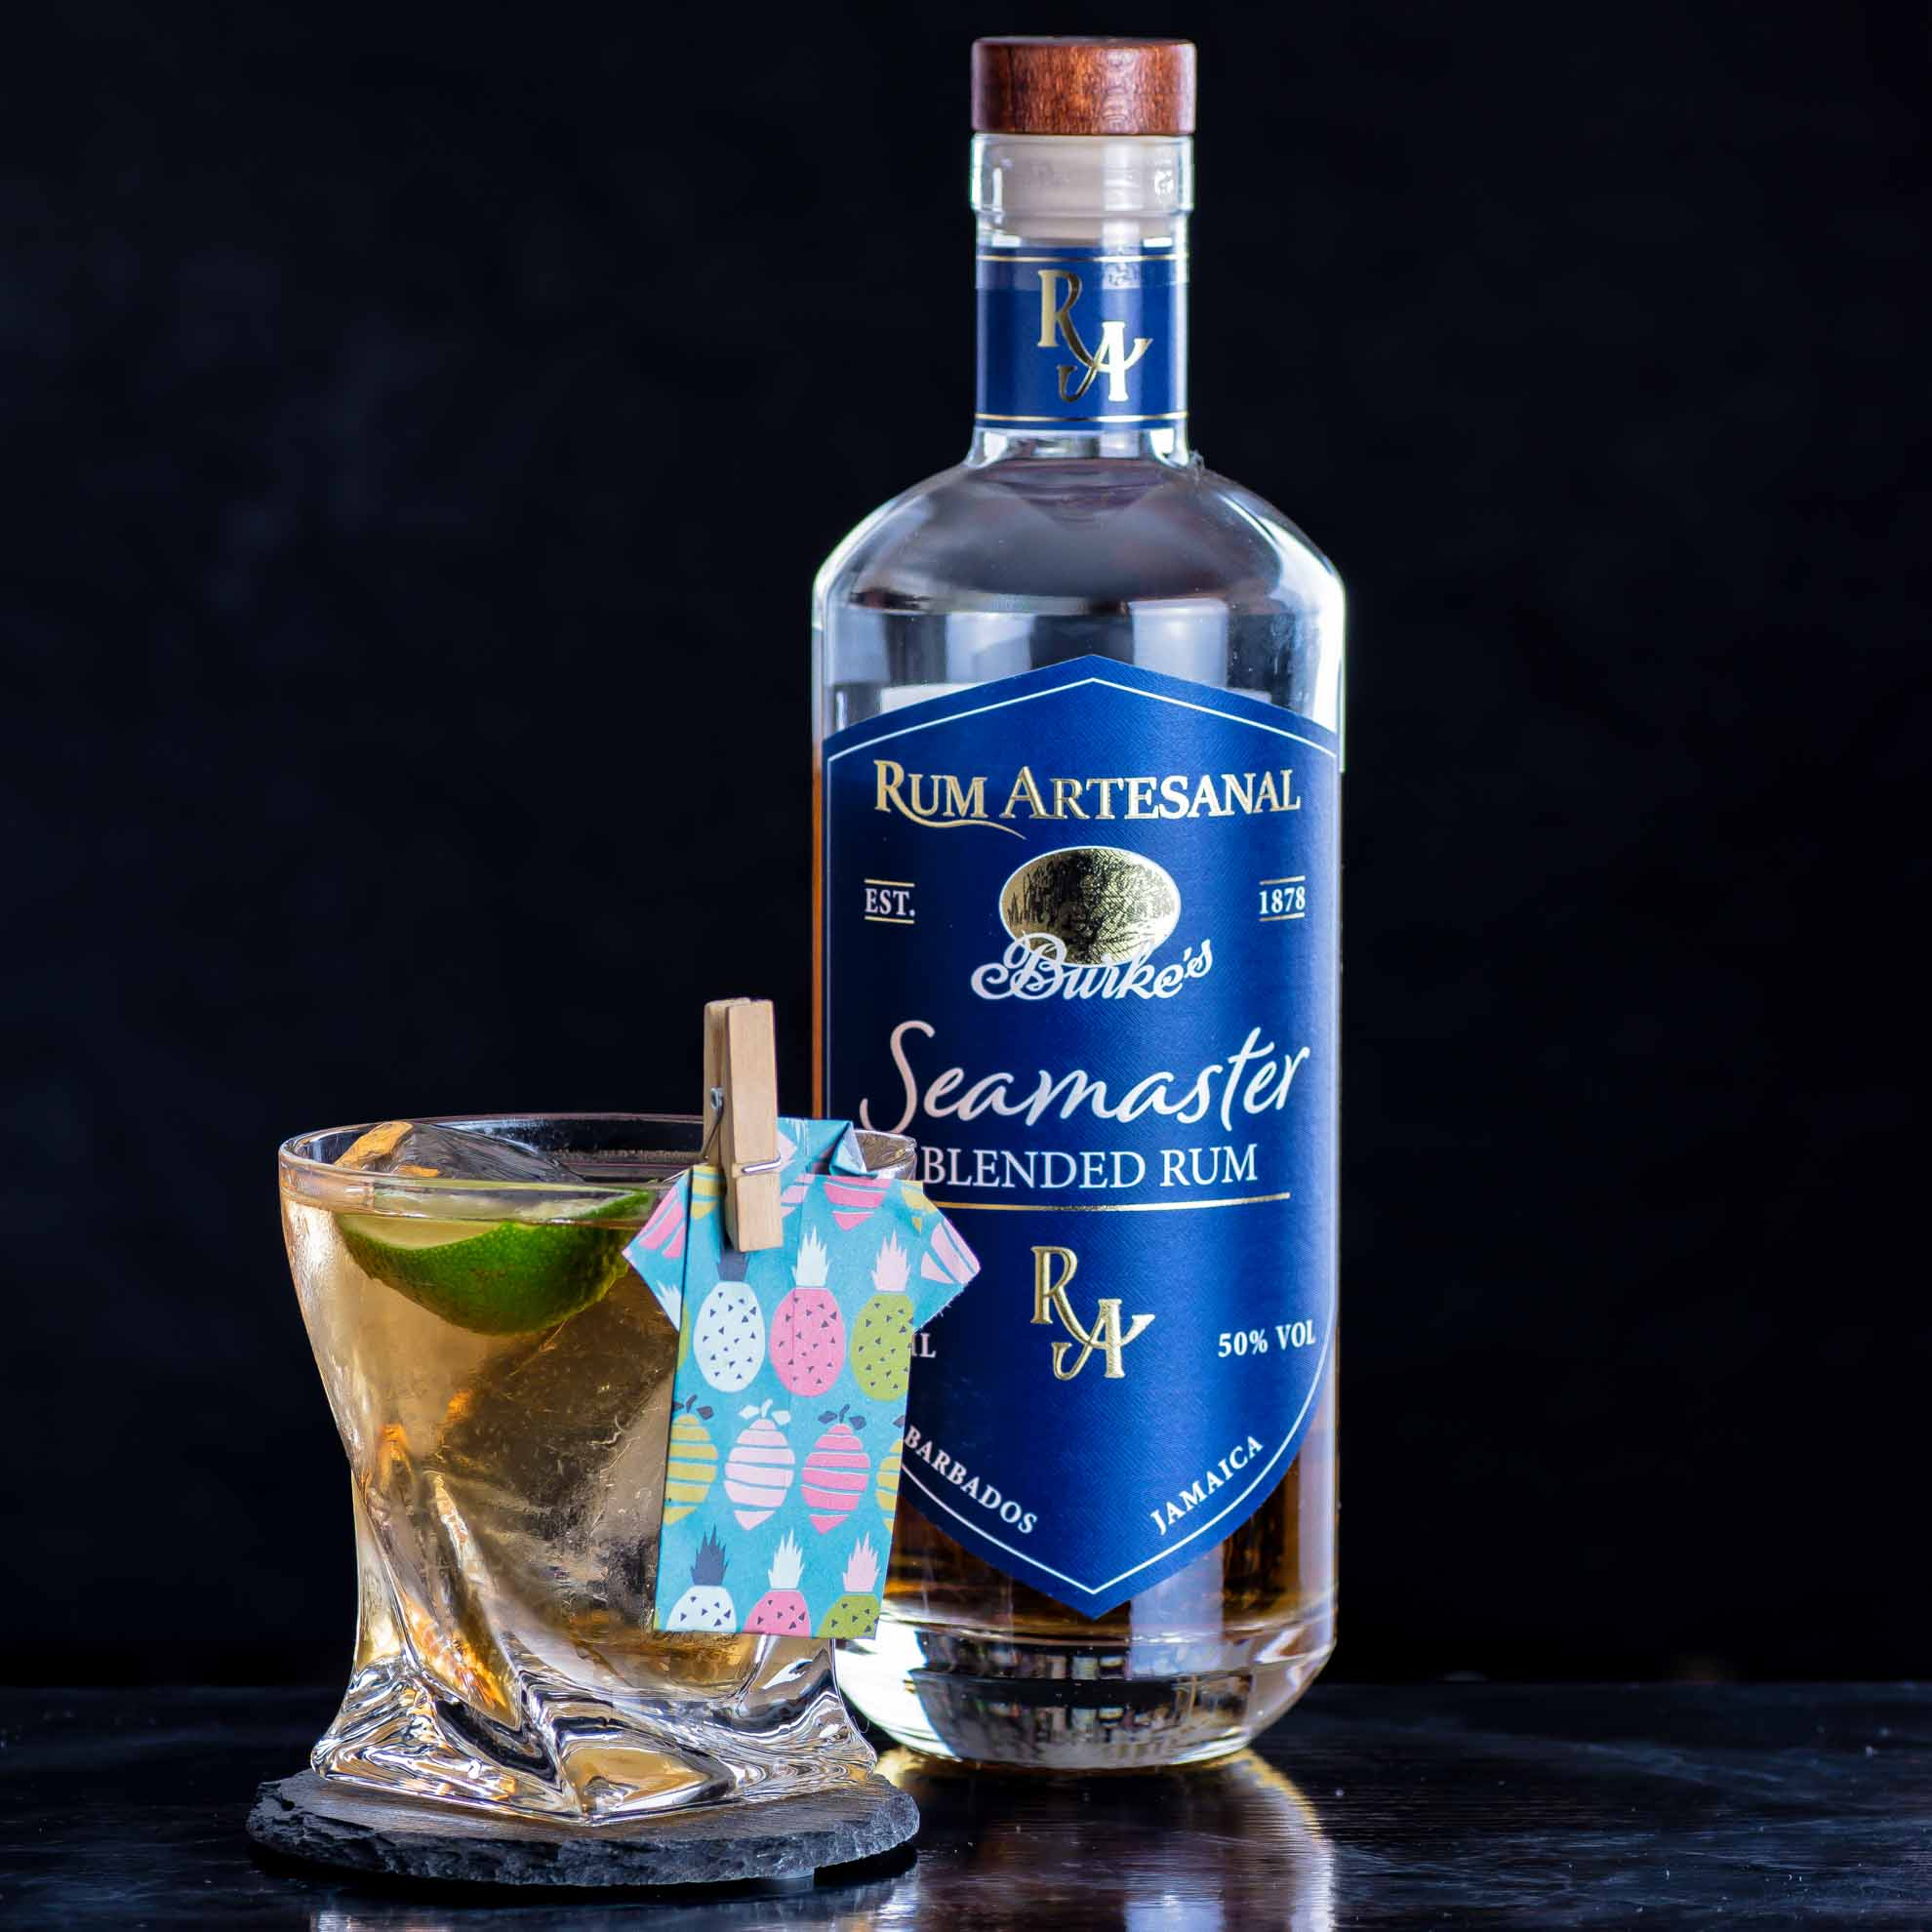 Rum Artesanal Burke's Seamaster Blended Rum in einem Corn 'n' Oil.